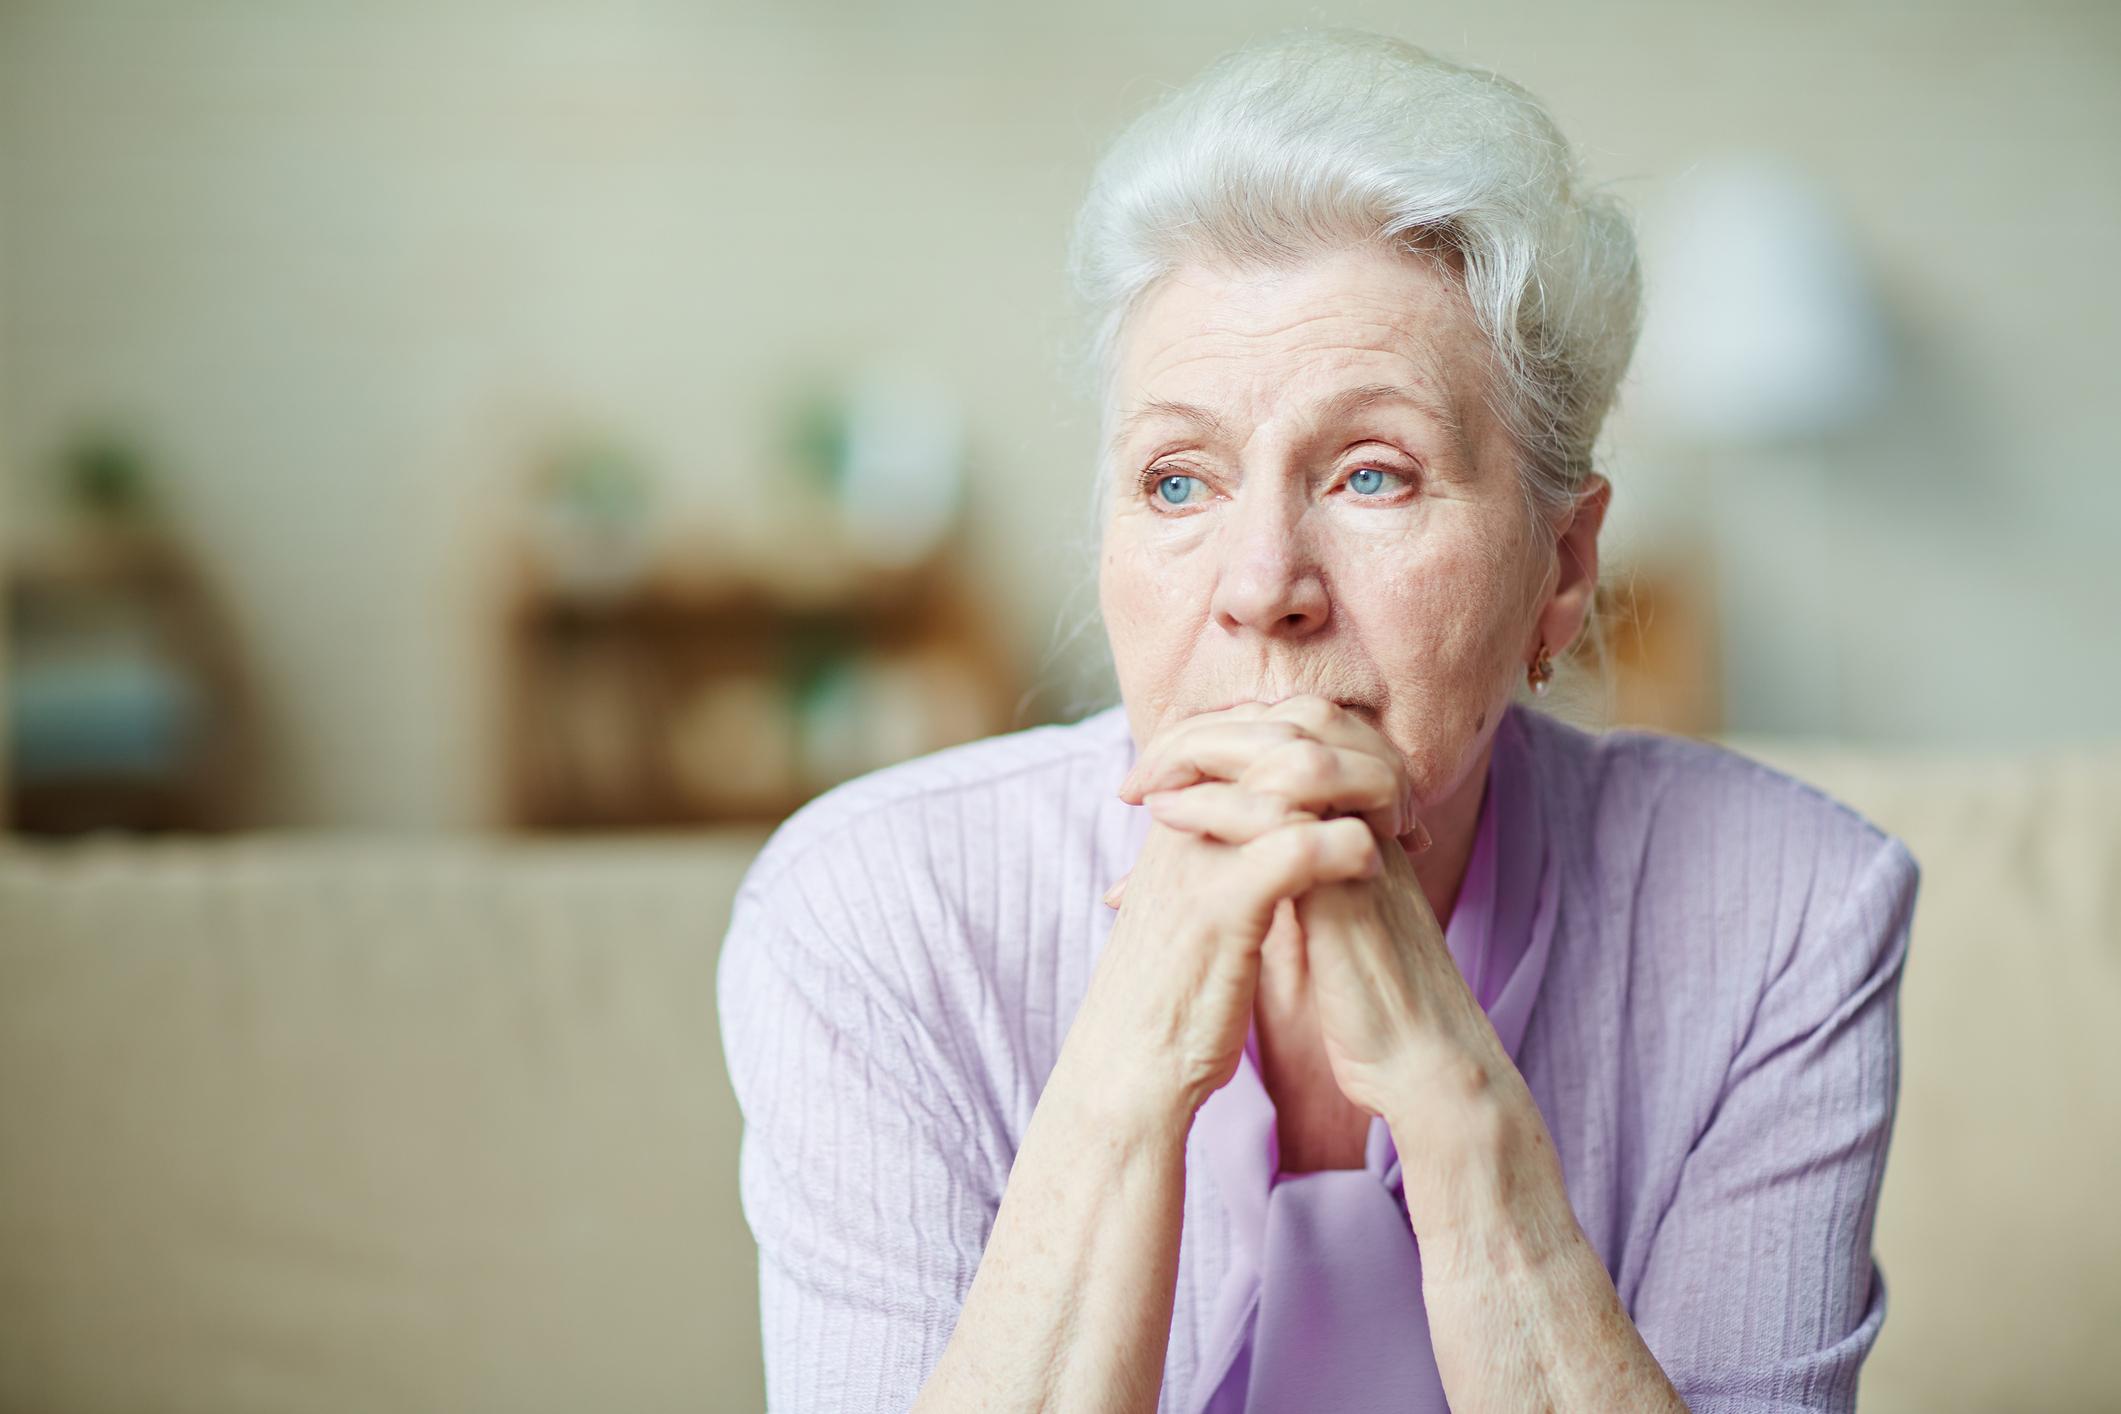 Older woman looking worried with her hands crossed